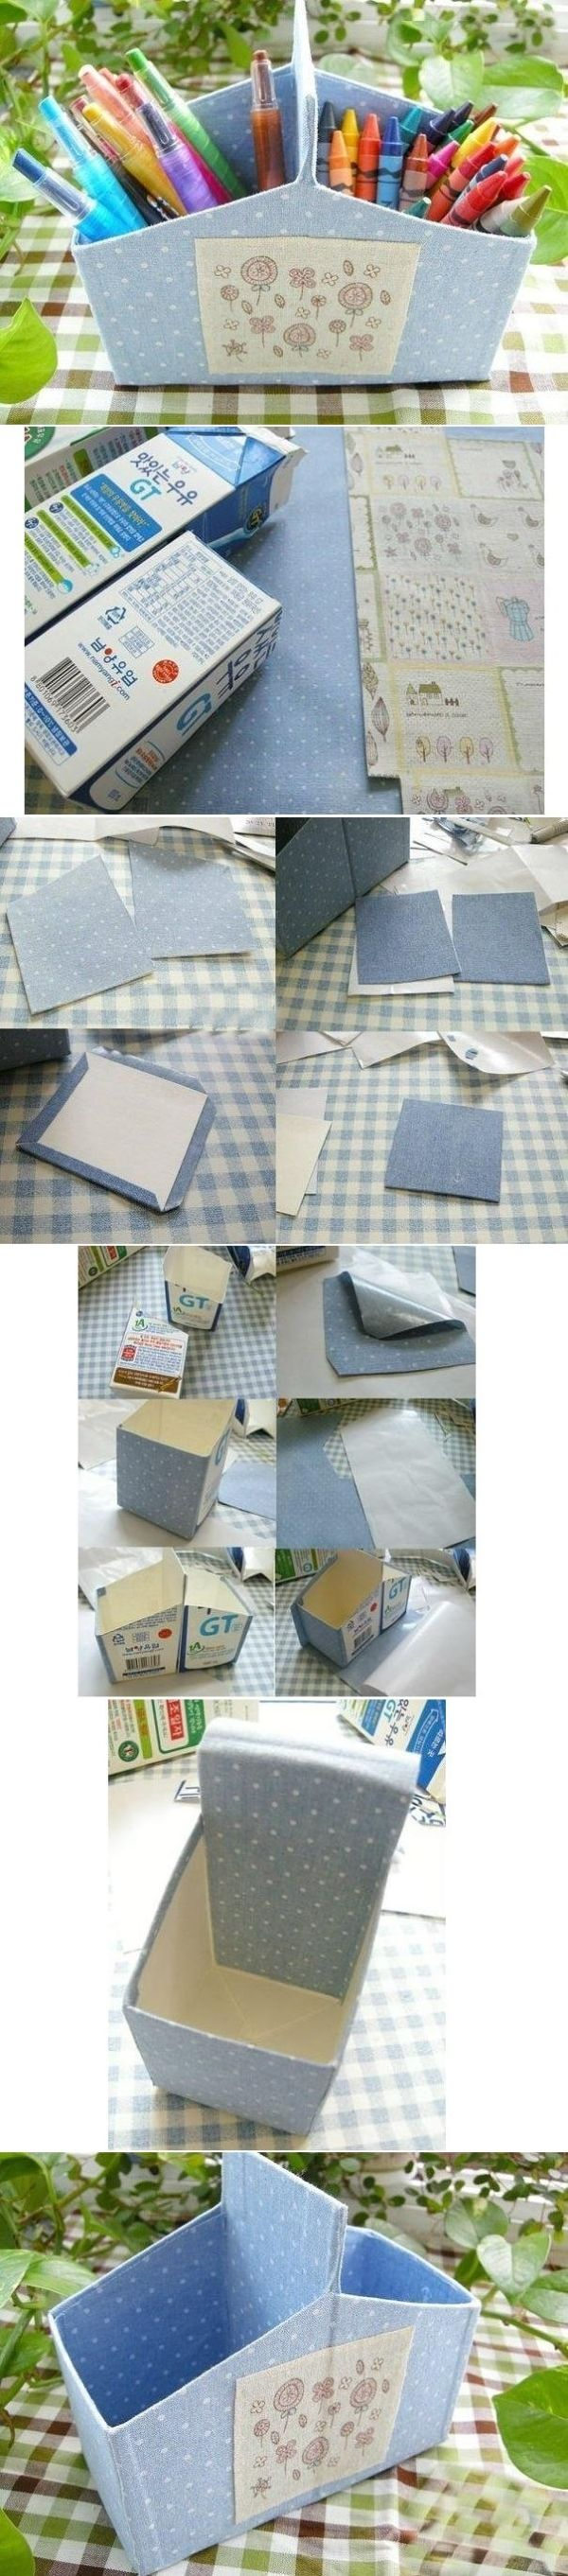 Diy milk carton organizer diy fabulous pinterest crafts diy milk carton organizer solutioingenieria Choice Image